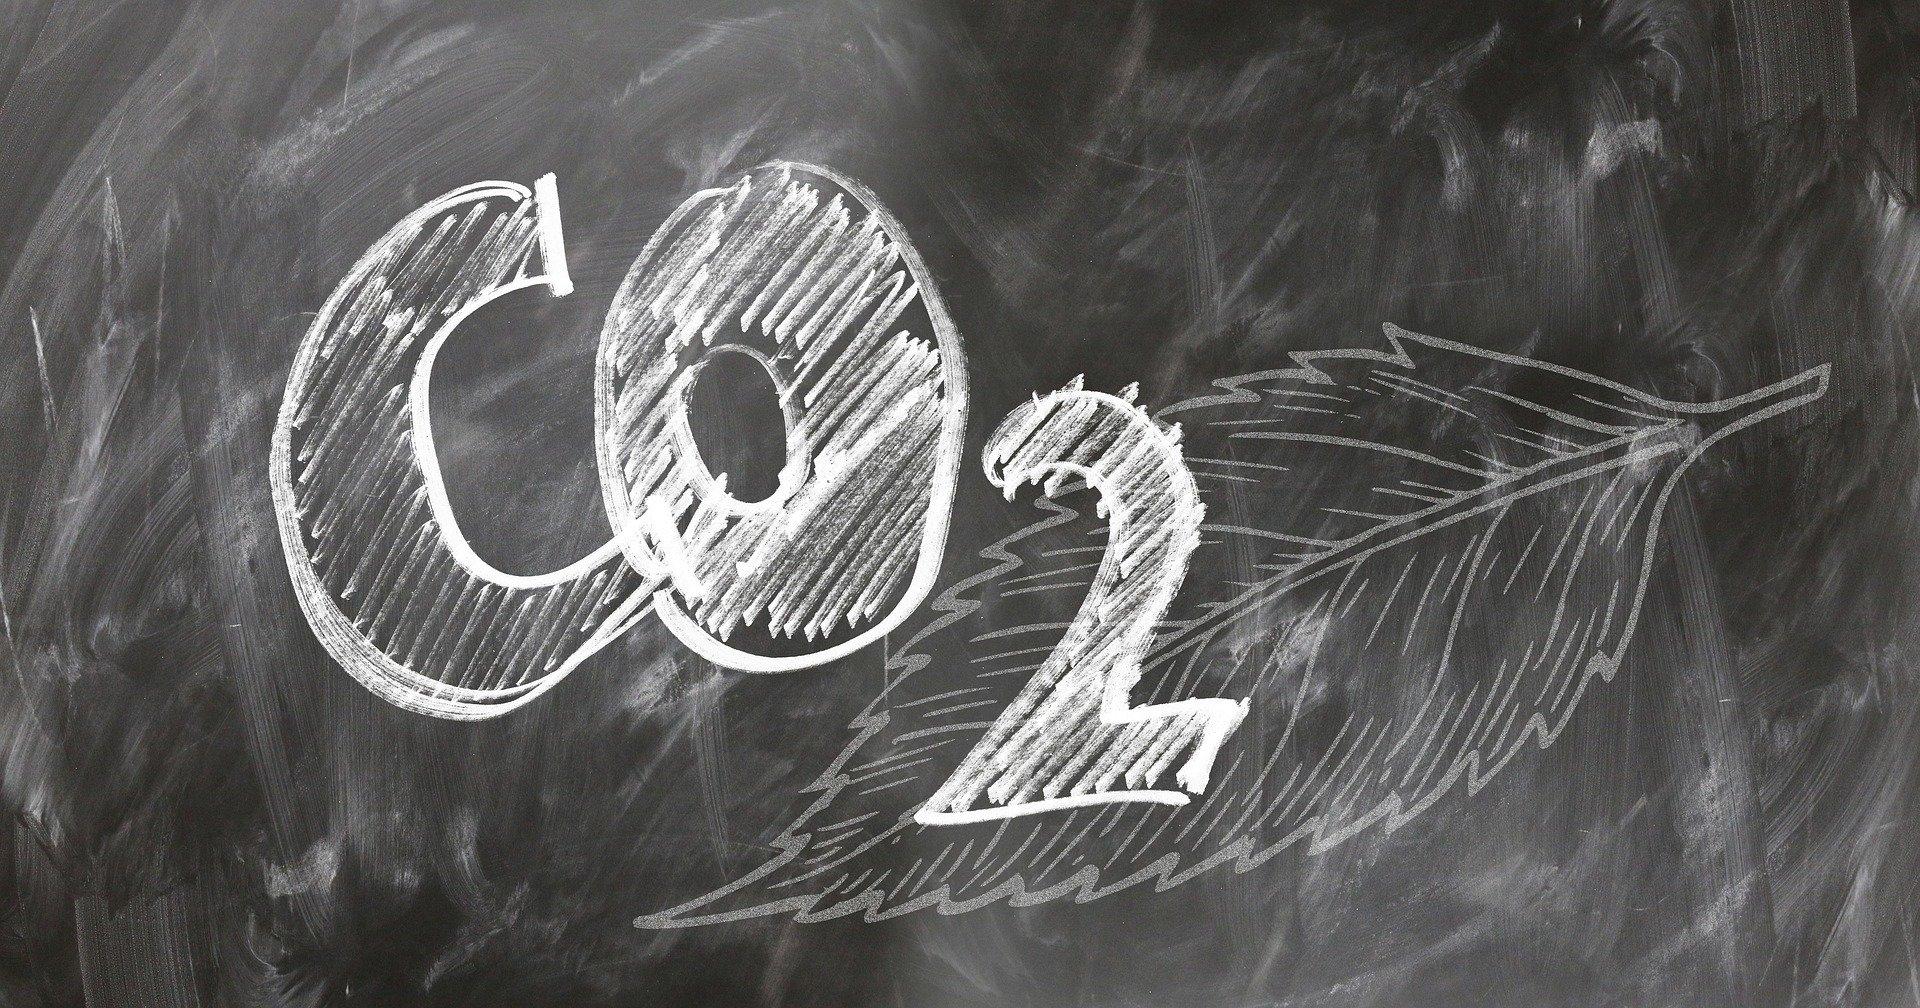 Powder could help cut CO2 emissions